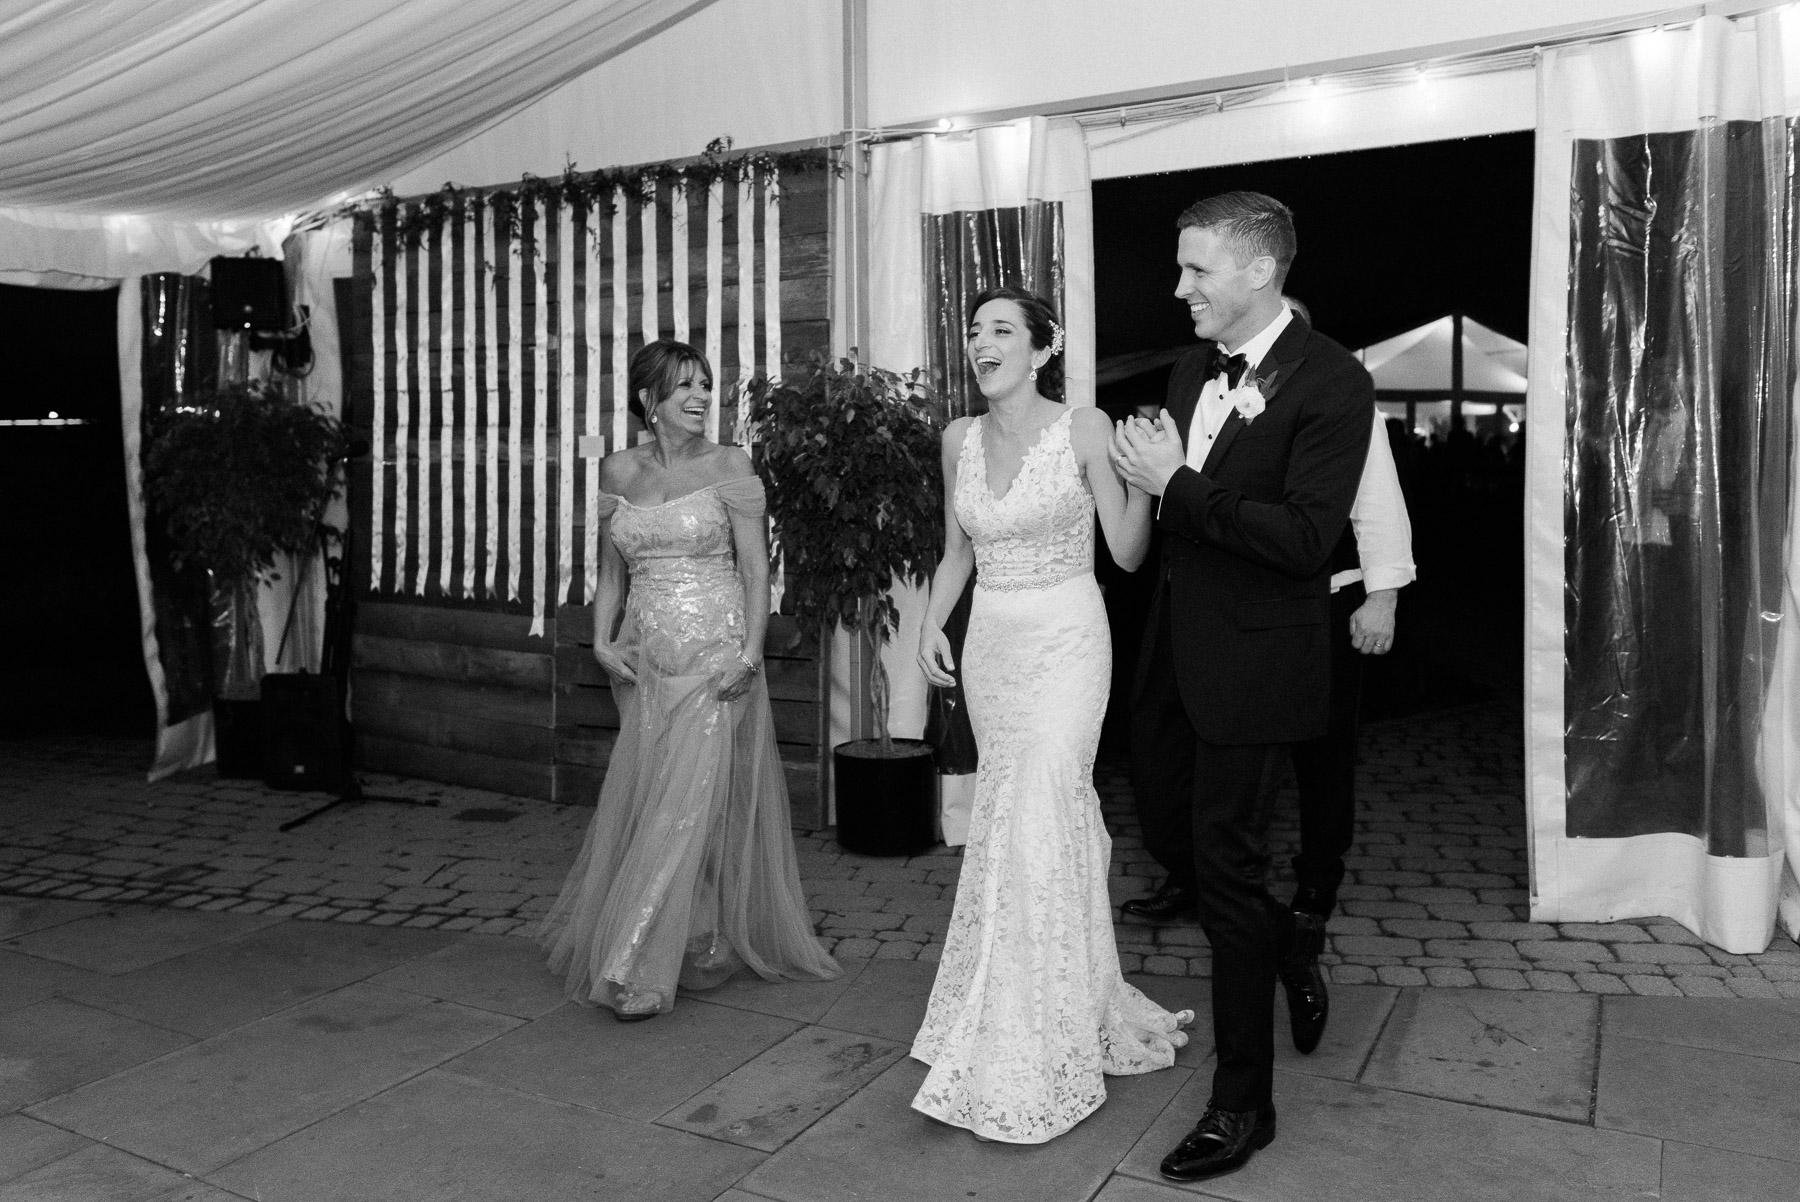 Surprised Bride and Groom